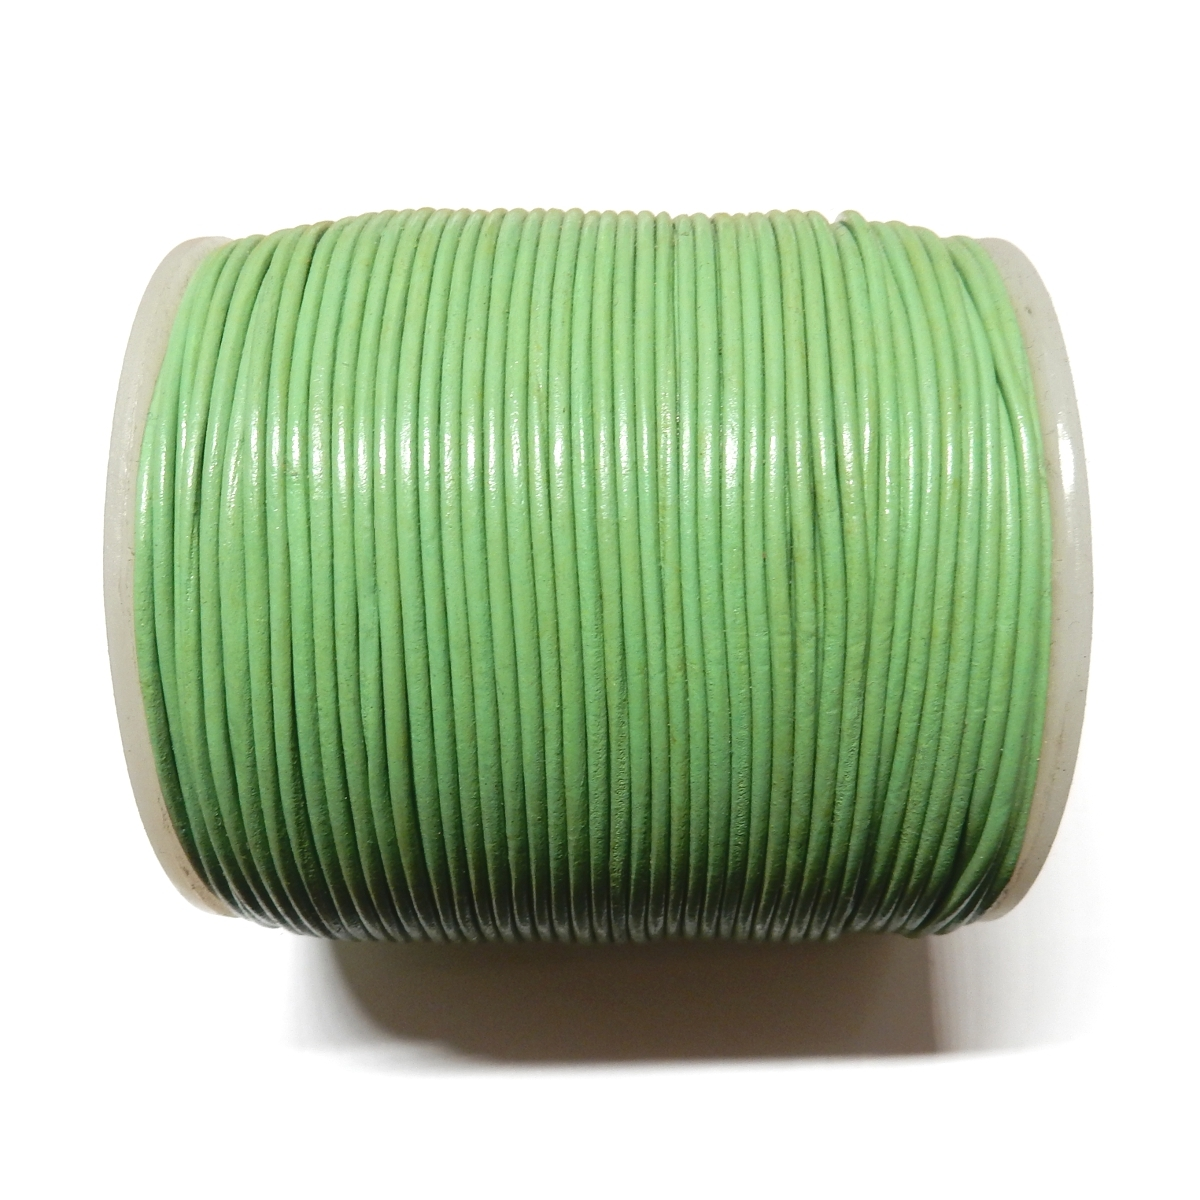 Cordon Cuero 1.5mm - Verde Claro 125